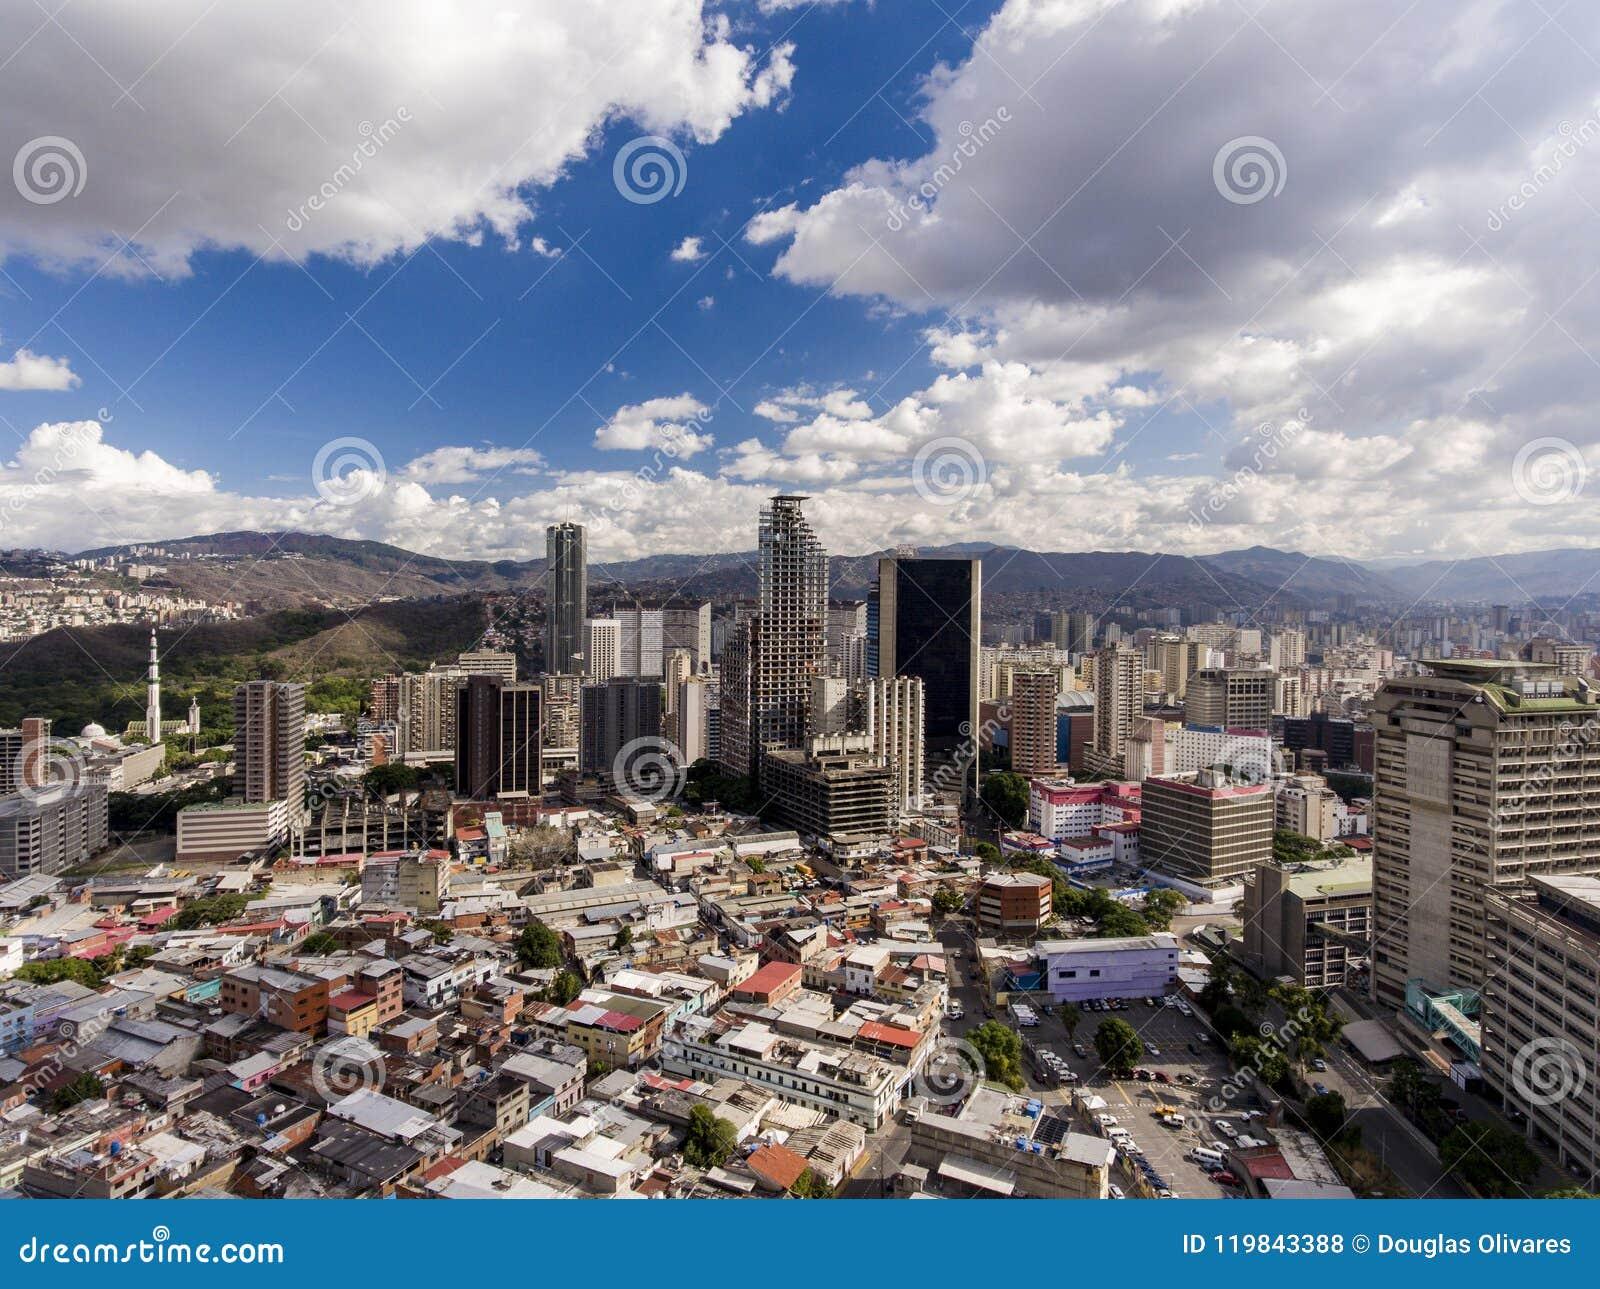 Vista aerea della città di Caracas, Venezuela